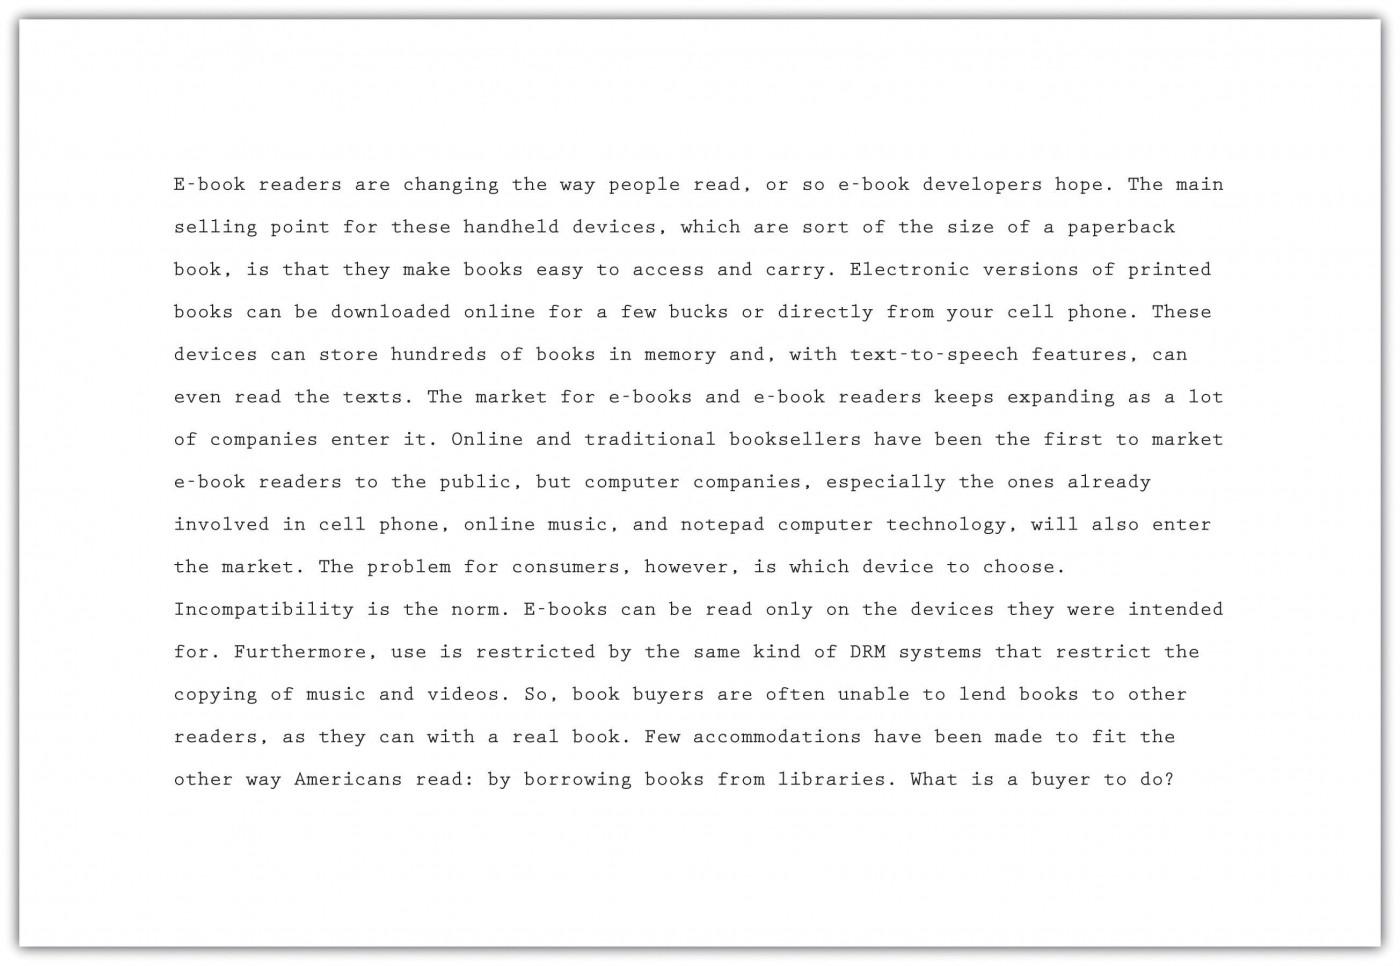 004 High School Vs College Essay Staggering And Compare Contrast Pdf Conclusion 1400